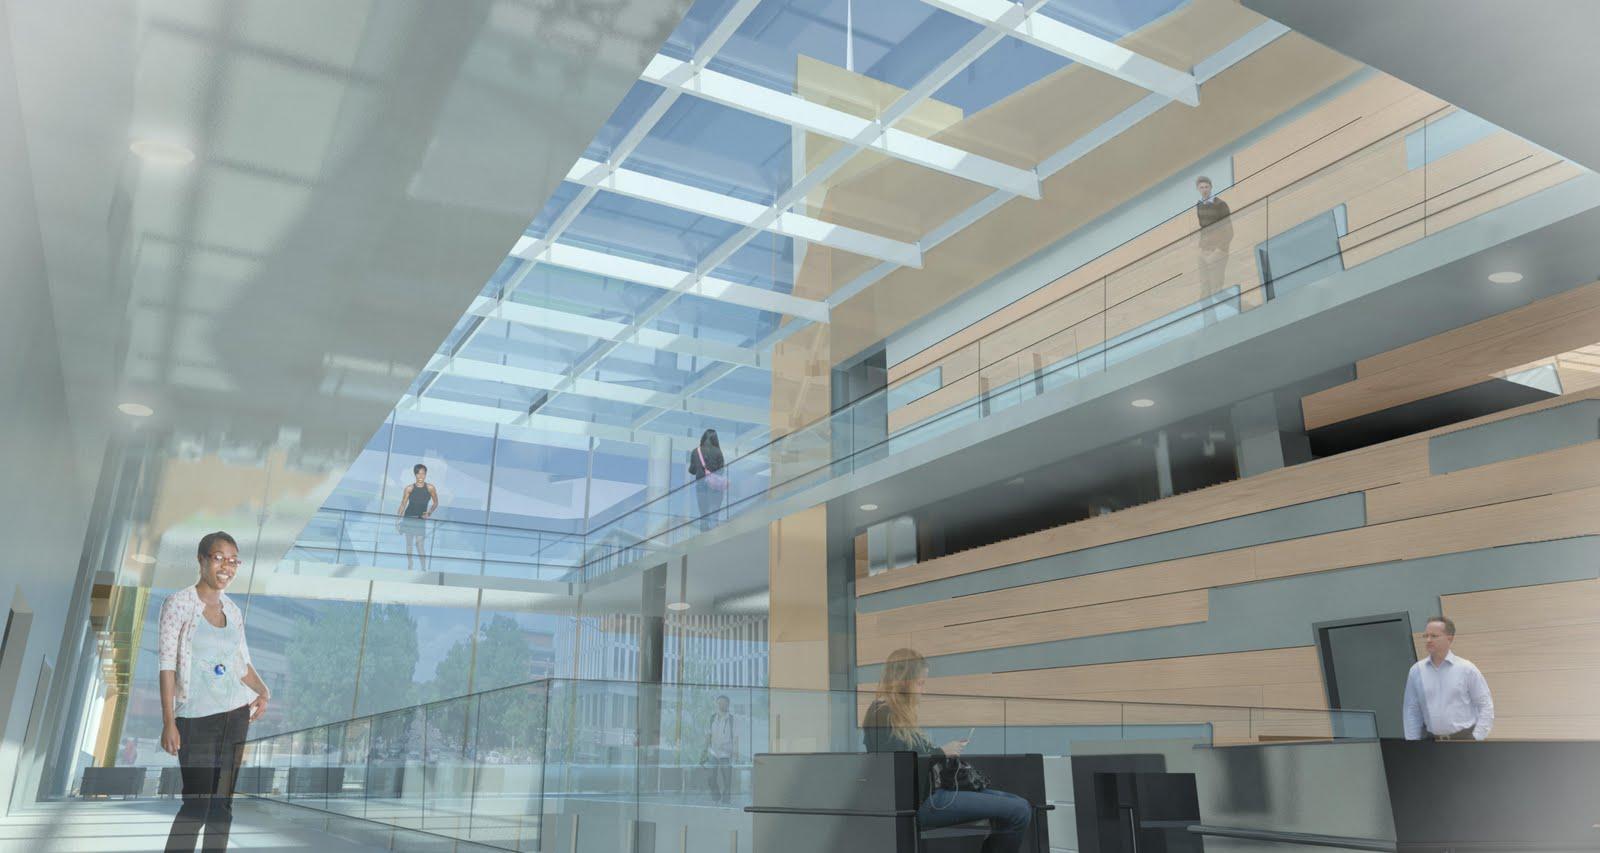 Interior design november 2012 for Interior architect jobs new york